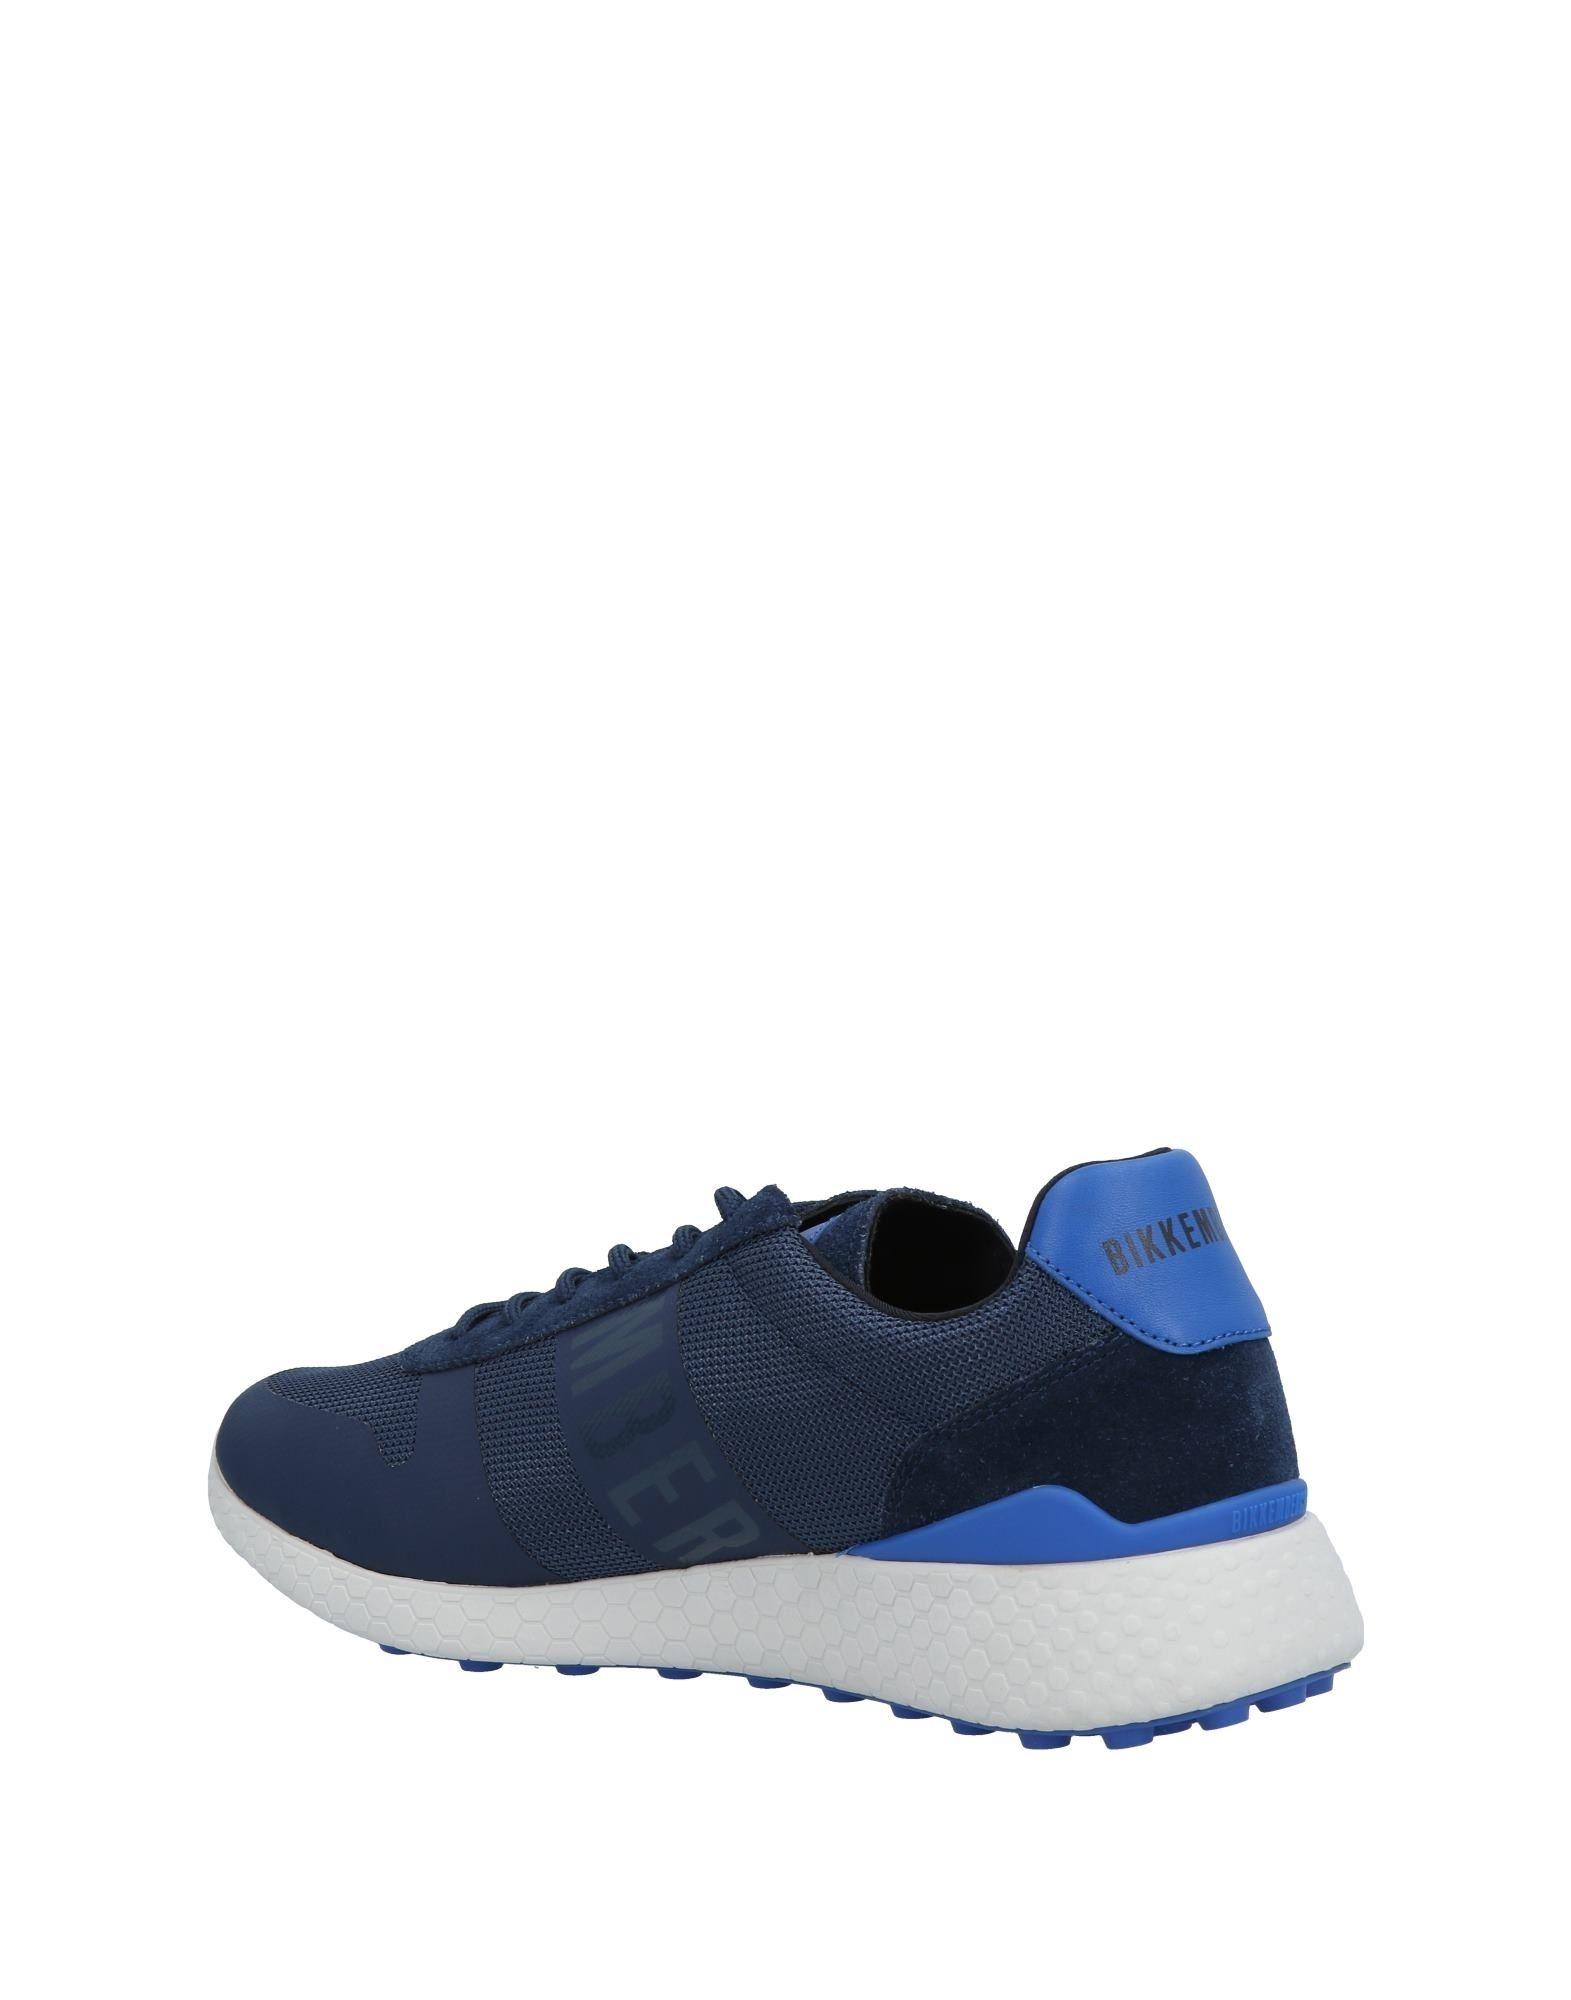 Bikkembergs Sneakers - Men Men Men Bikkembergs Sneakers online on  United Kingdom - 11449939QP 8158d0